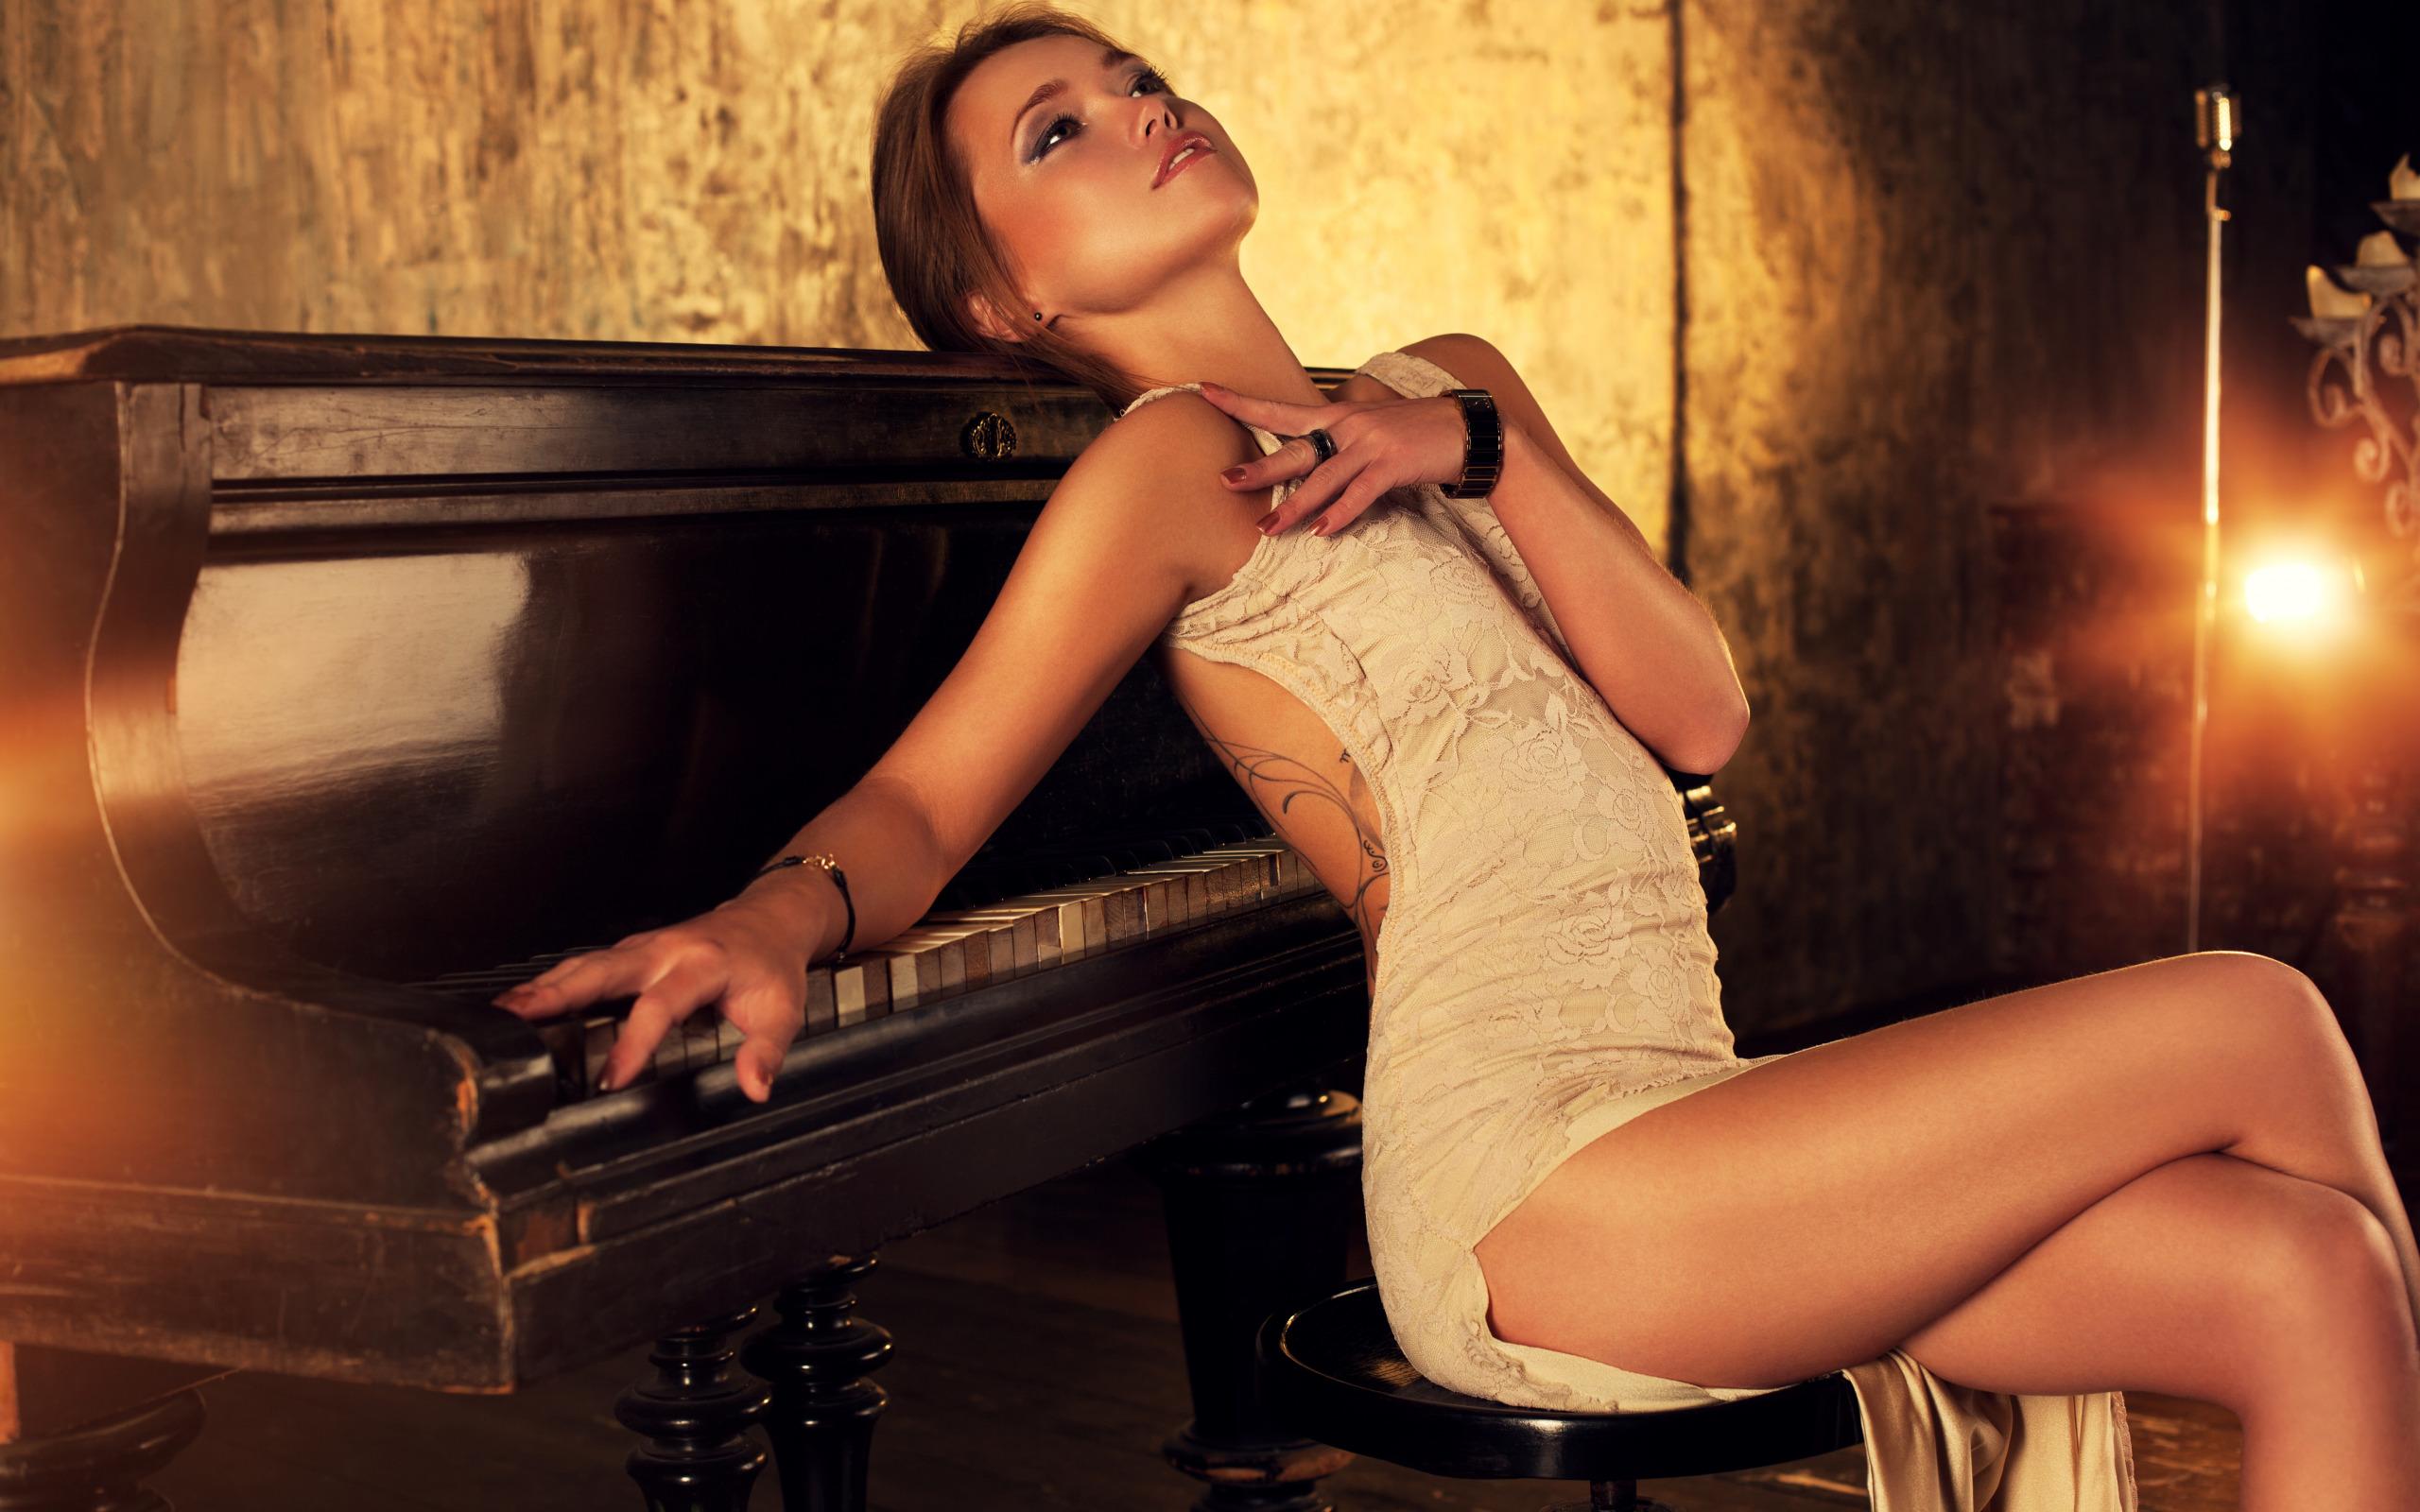 Sexy female dj playing music